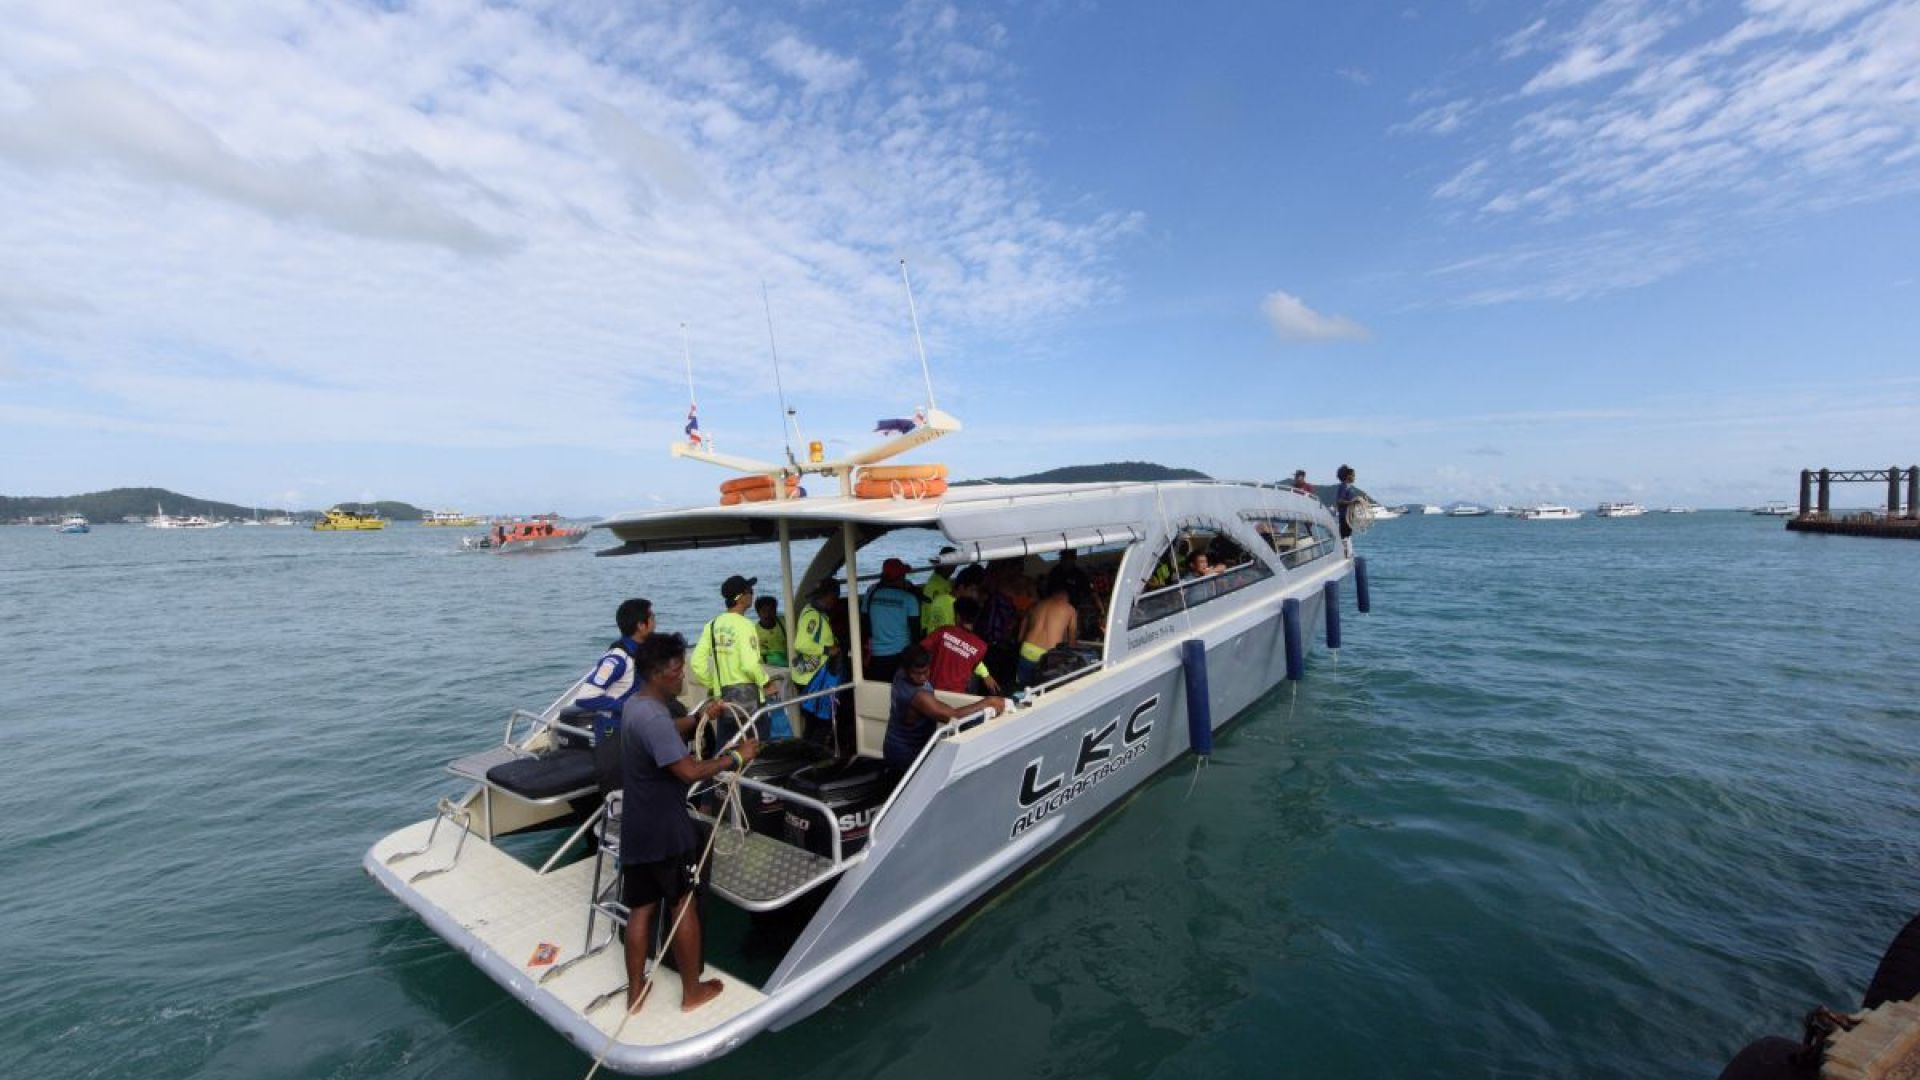 Кораб с туристи потъна край остров Пукет